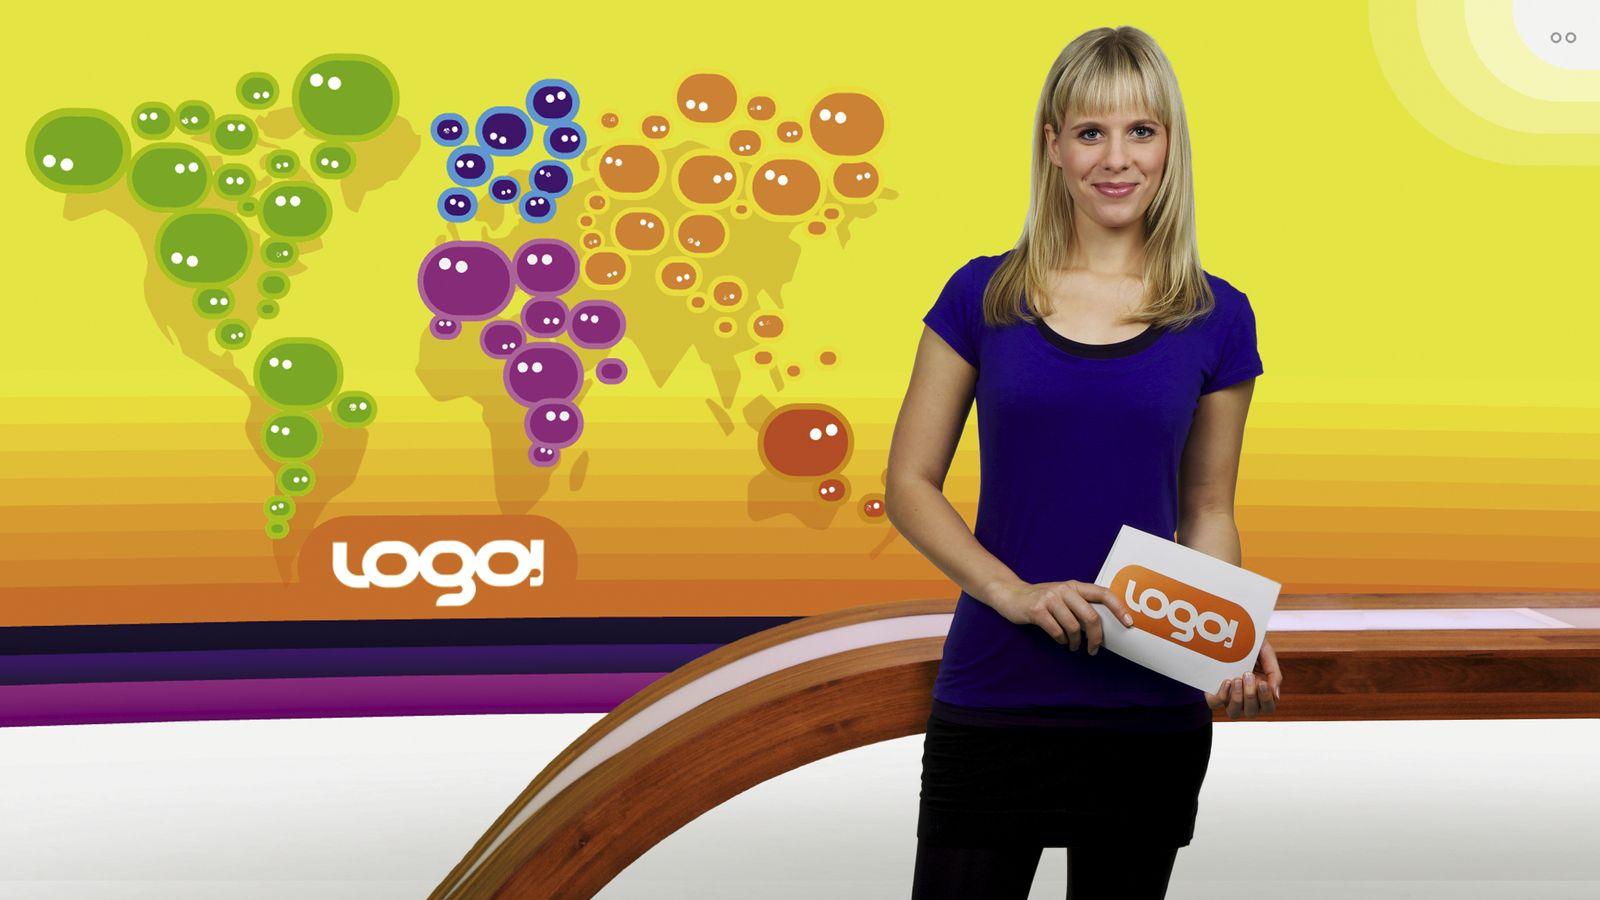 ZDF/ logo!/ Linda Joe Fuhrich